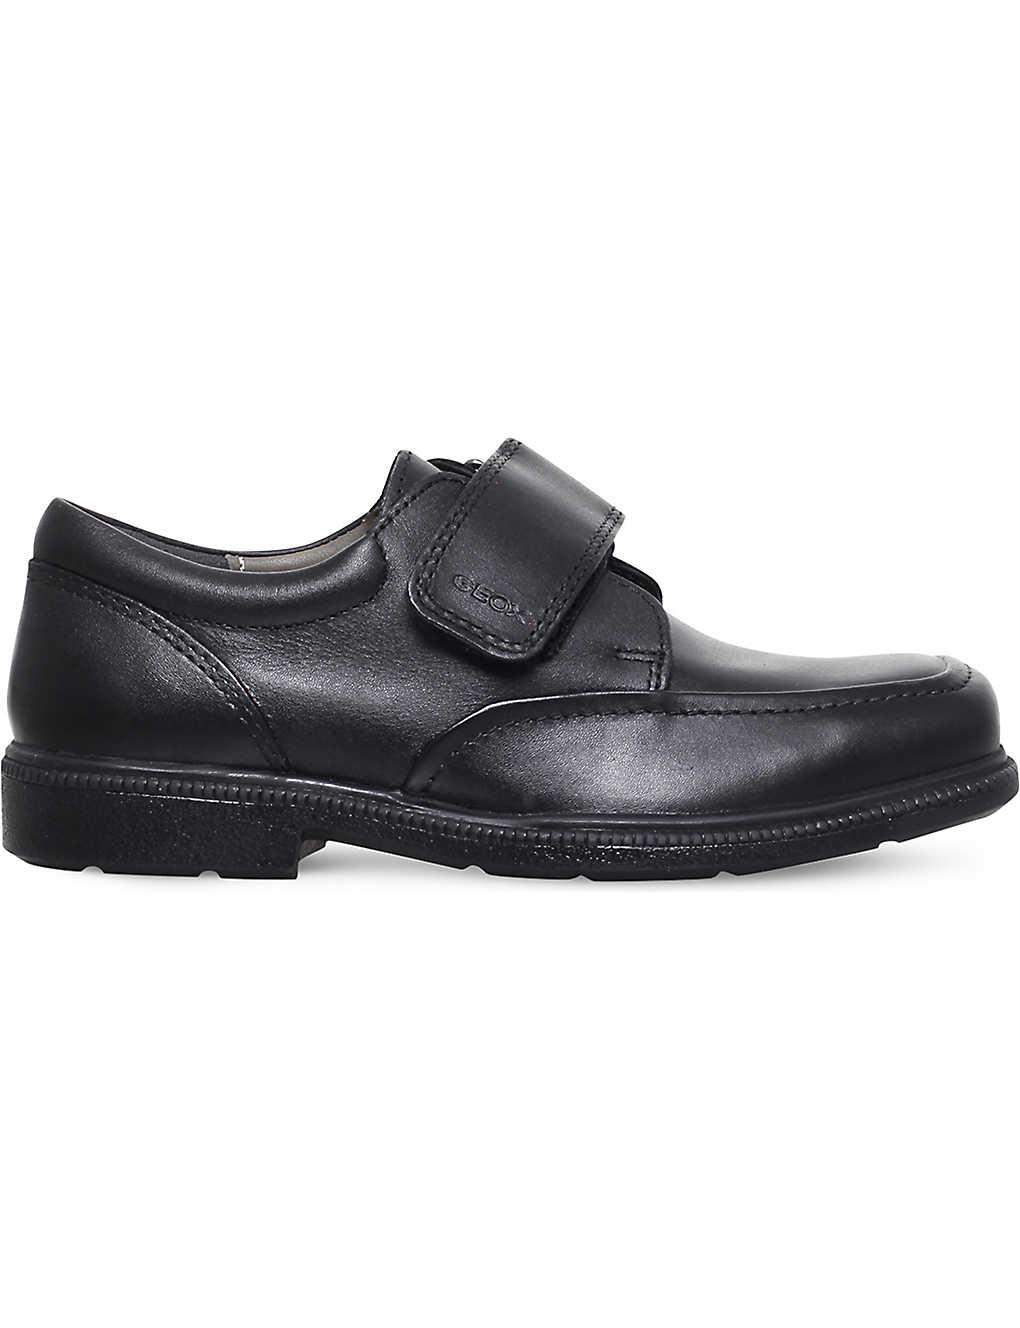 f5611332ccef2 GEOX - Federico leather school shoes 7-8 years | Selfridges.com